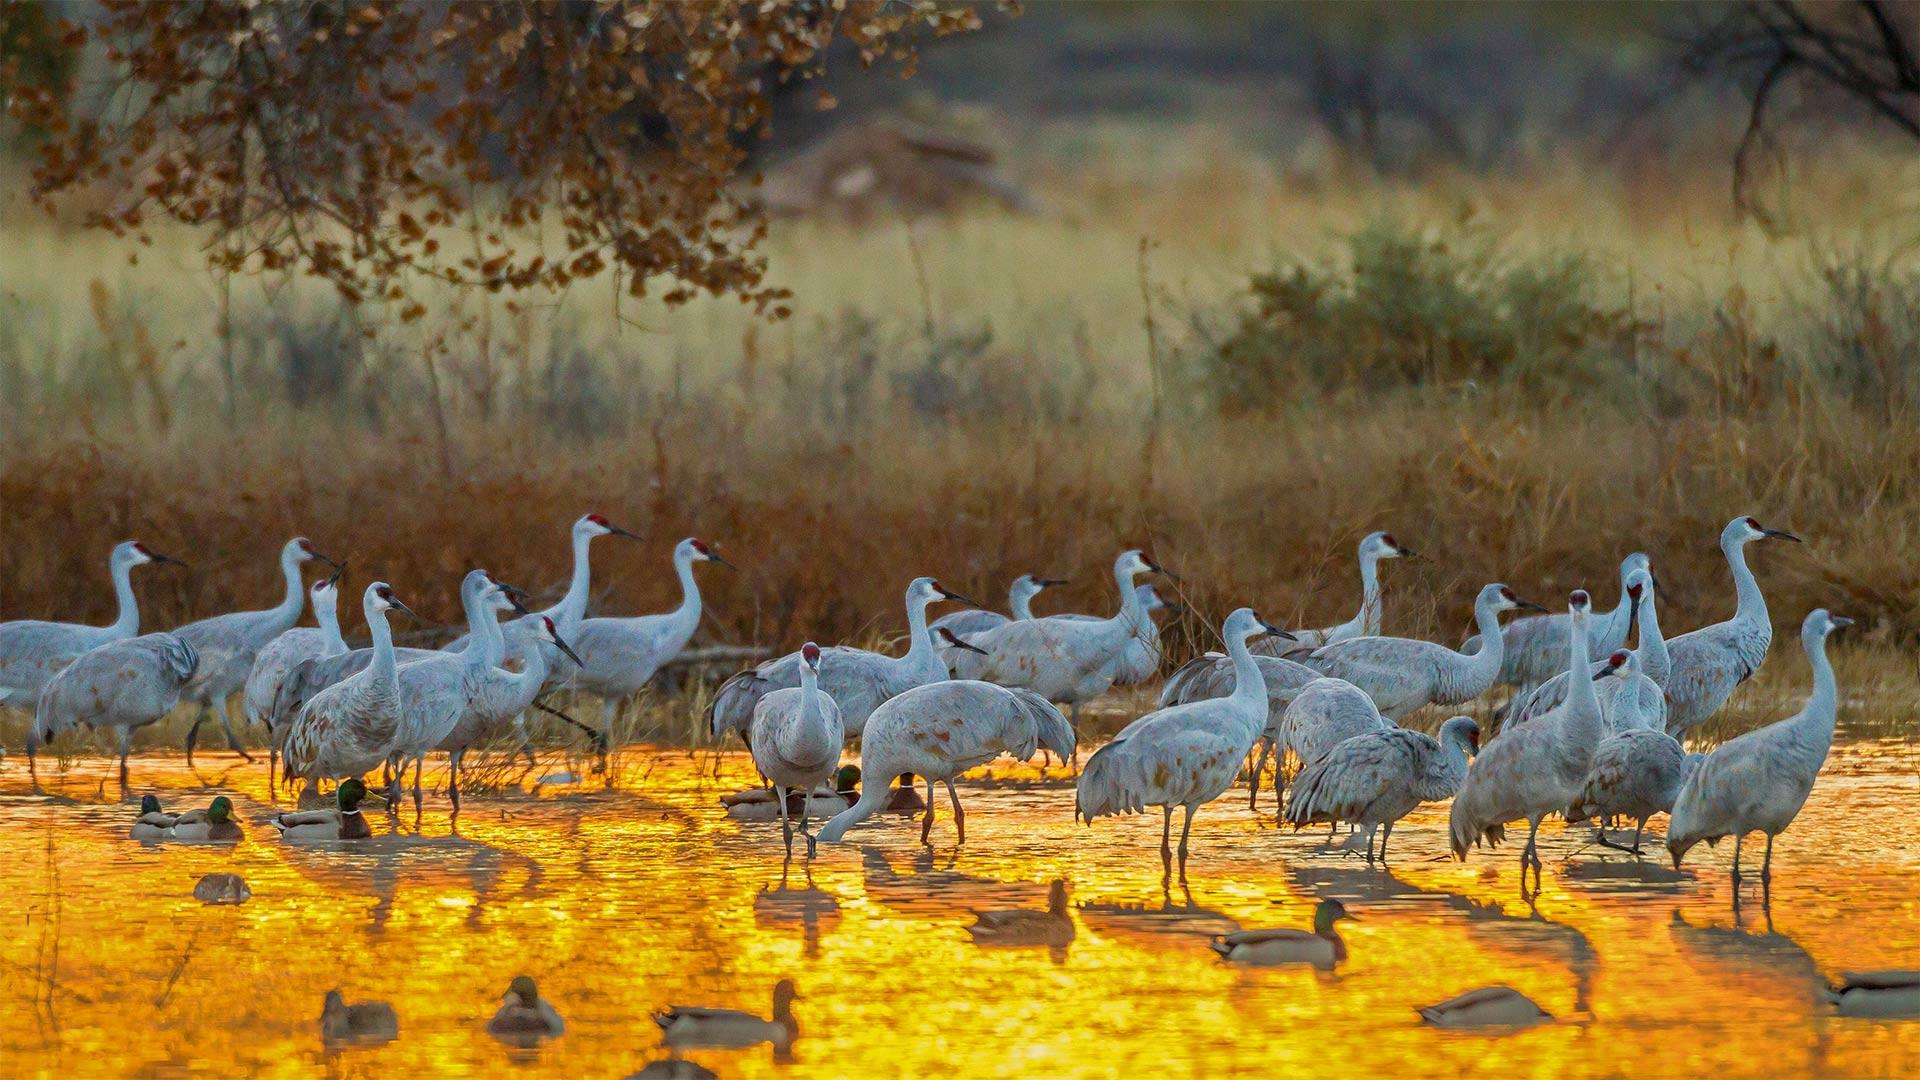 Sandhill cranes and mallard ducks, Bosque del Apache National Wildlife Refuge, New Mexico (© Cathy & Gordon Illg/Jaynes Gallery/DanitaDelimont.com)(Bing United States)